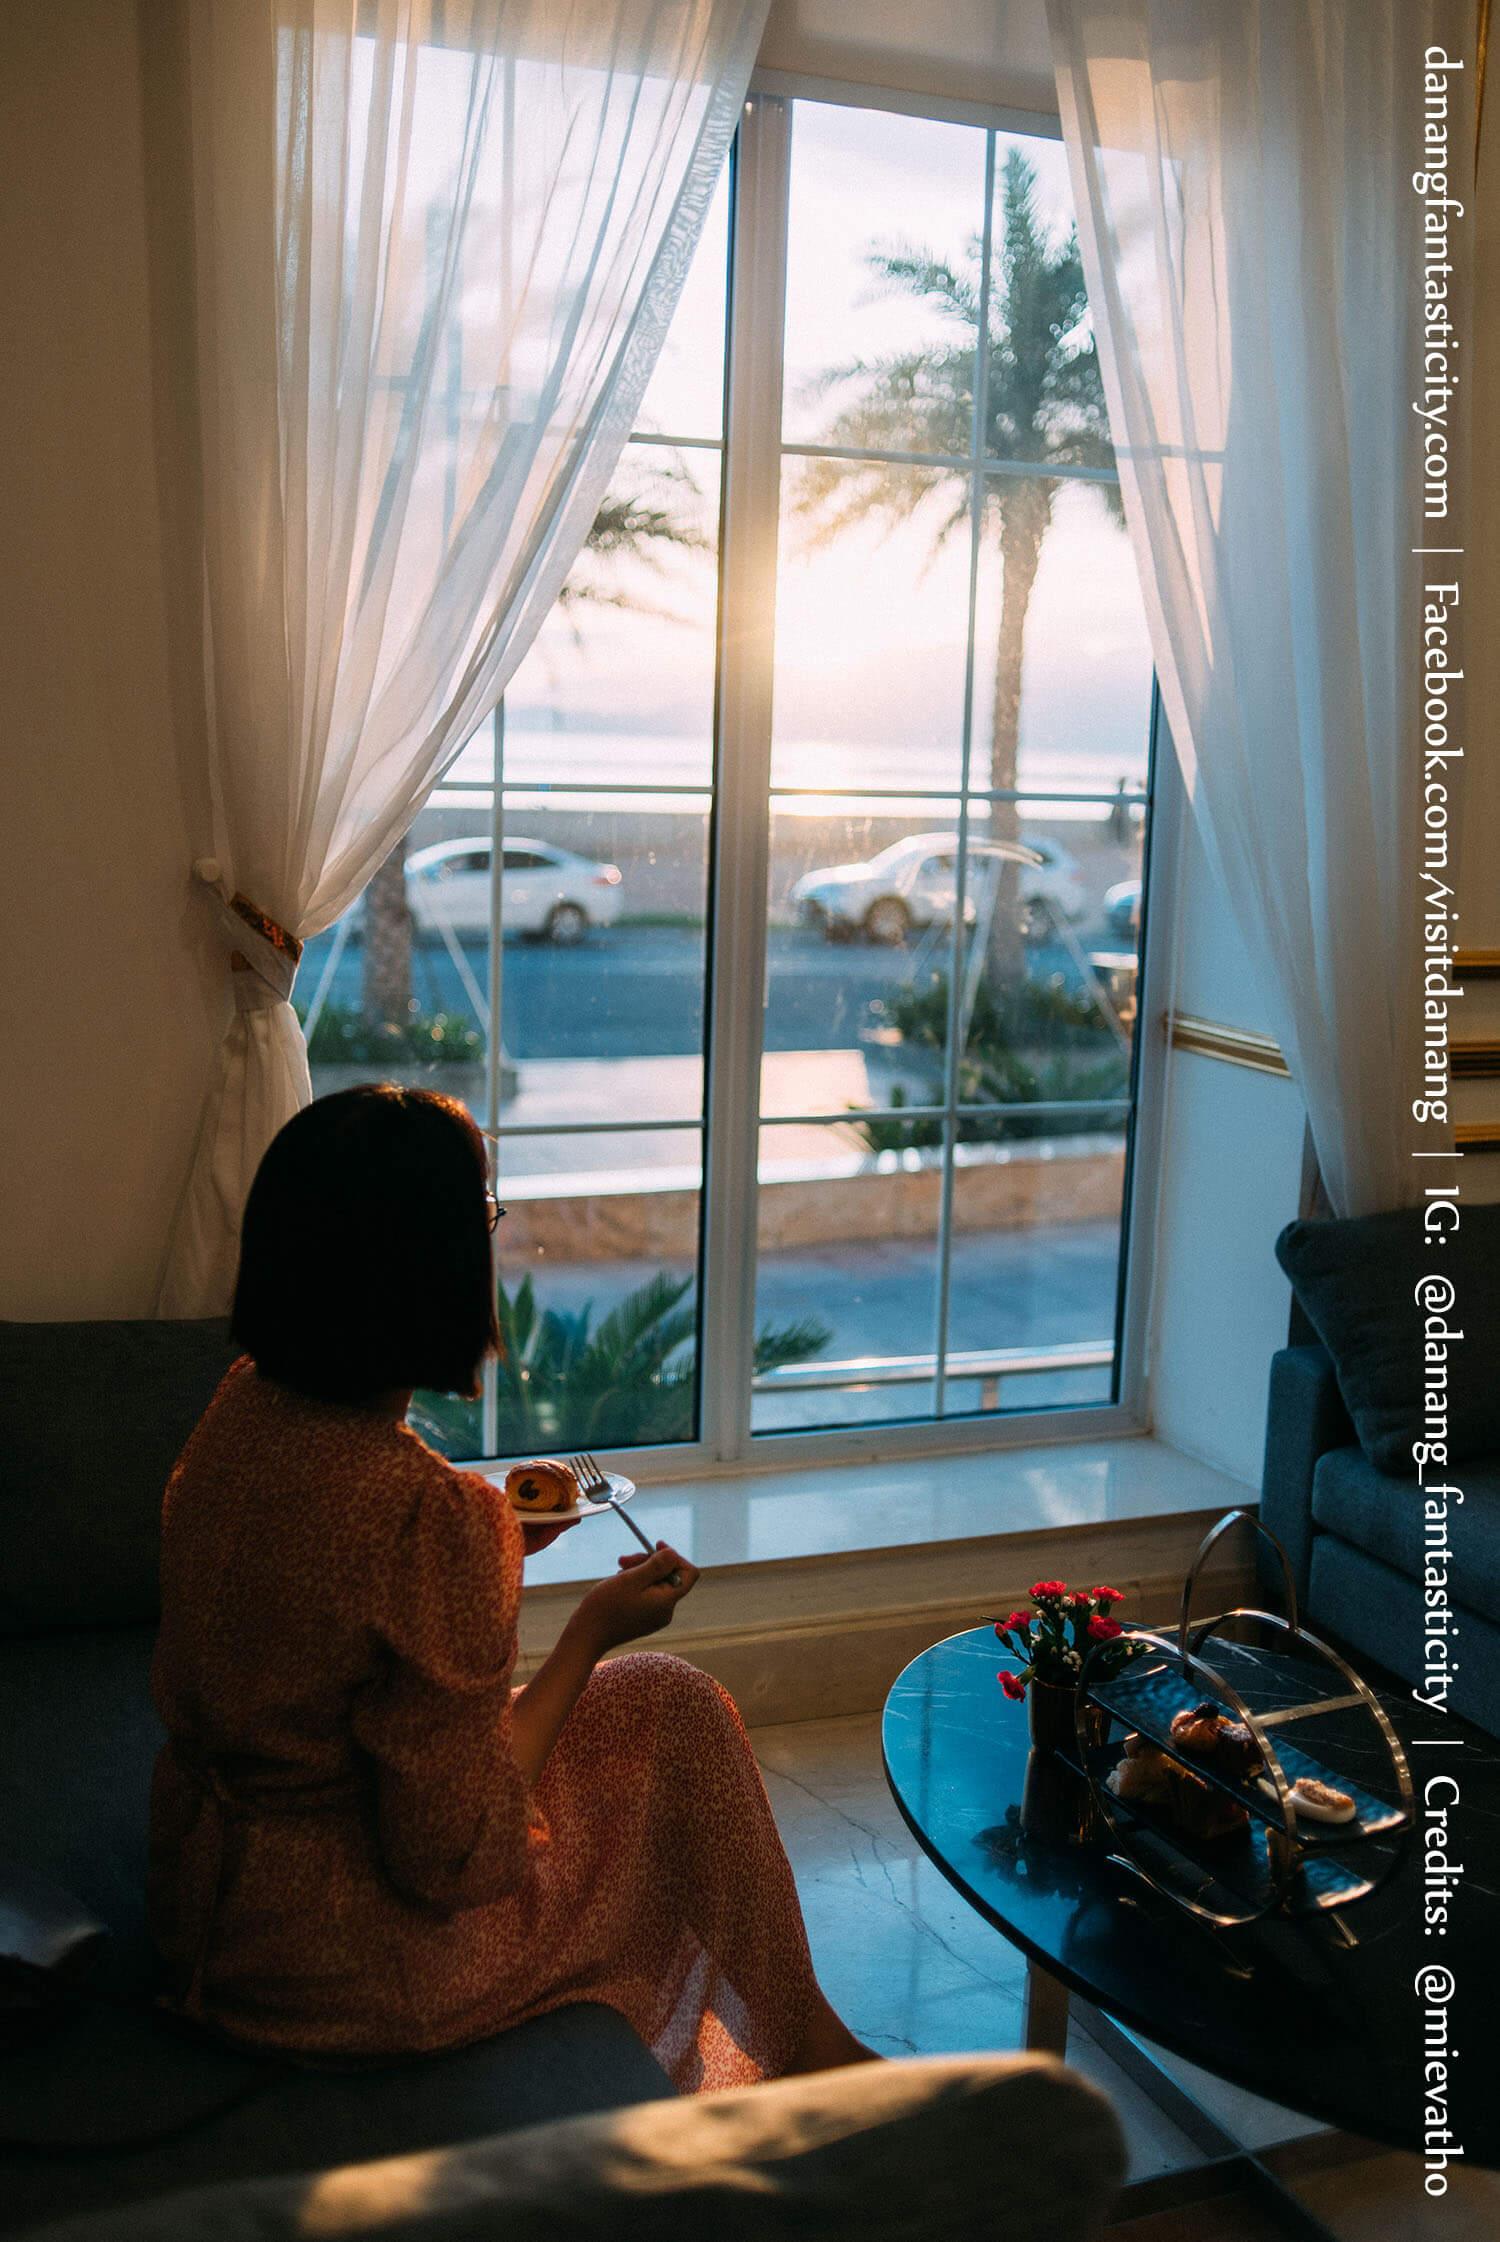 Danang Golden Bay Hoang Hon Vang Cua Da Nang Fantasticity Com 01